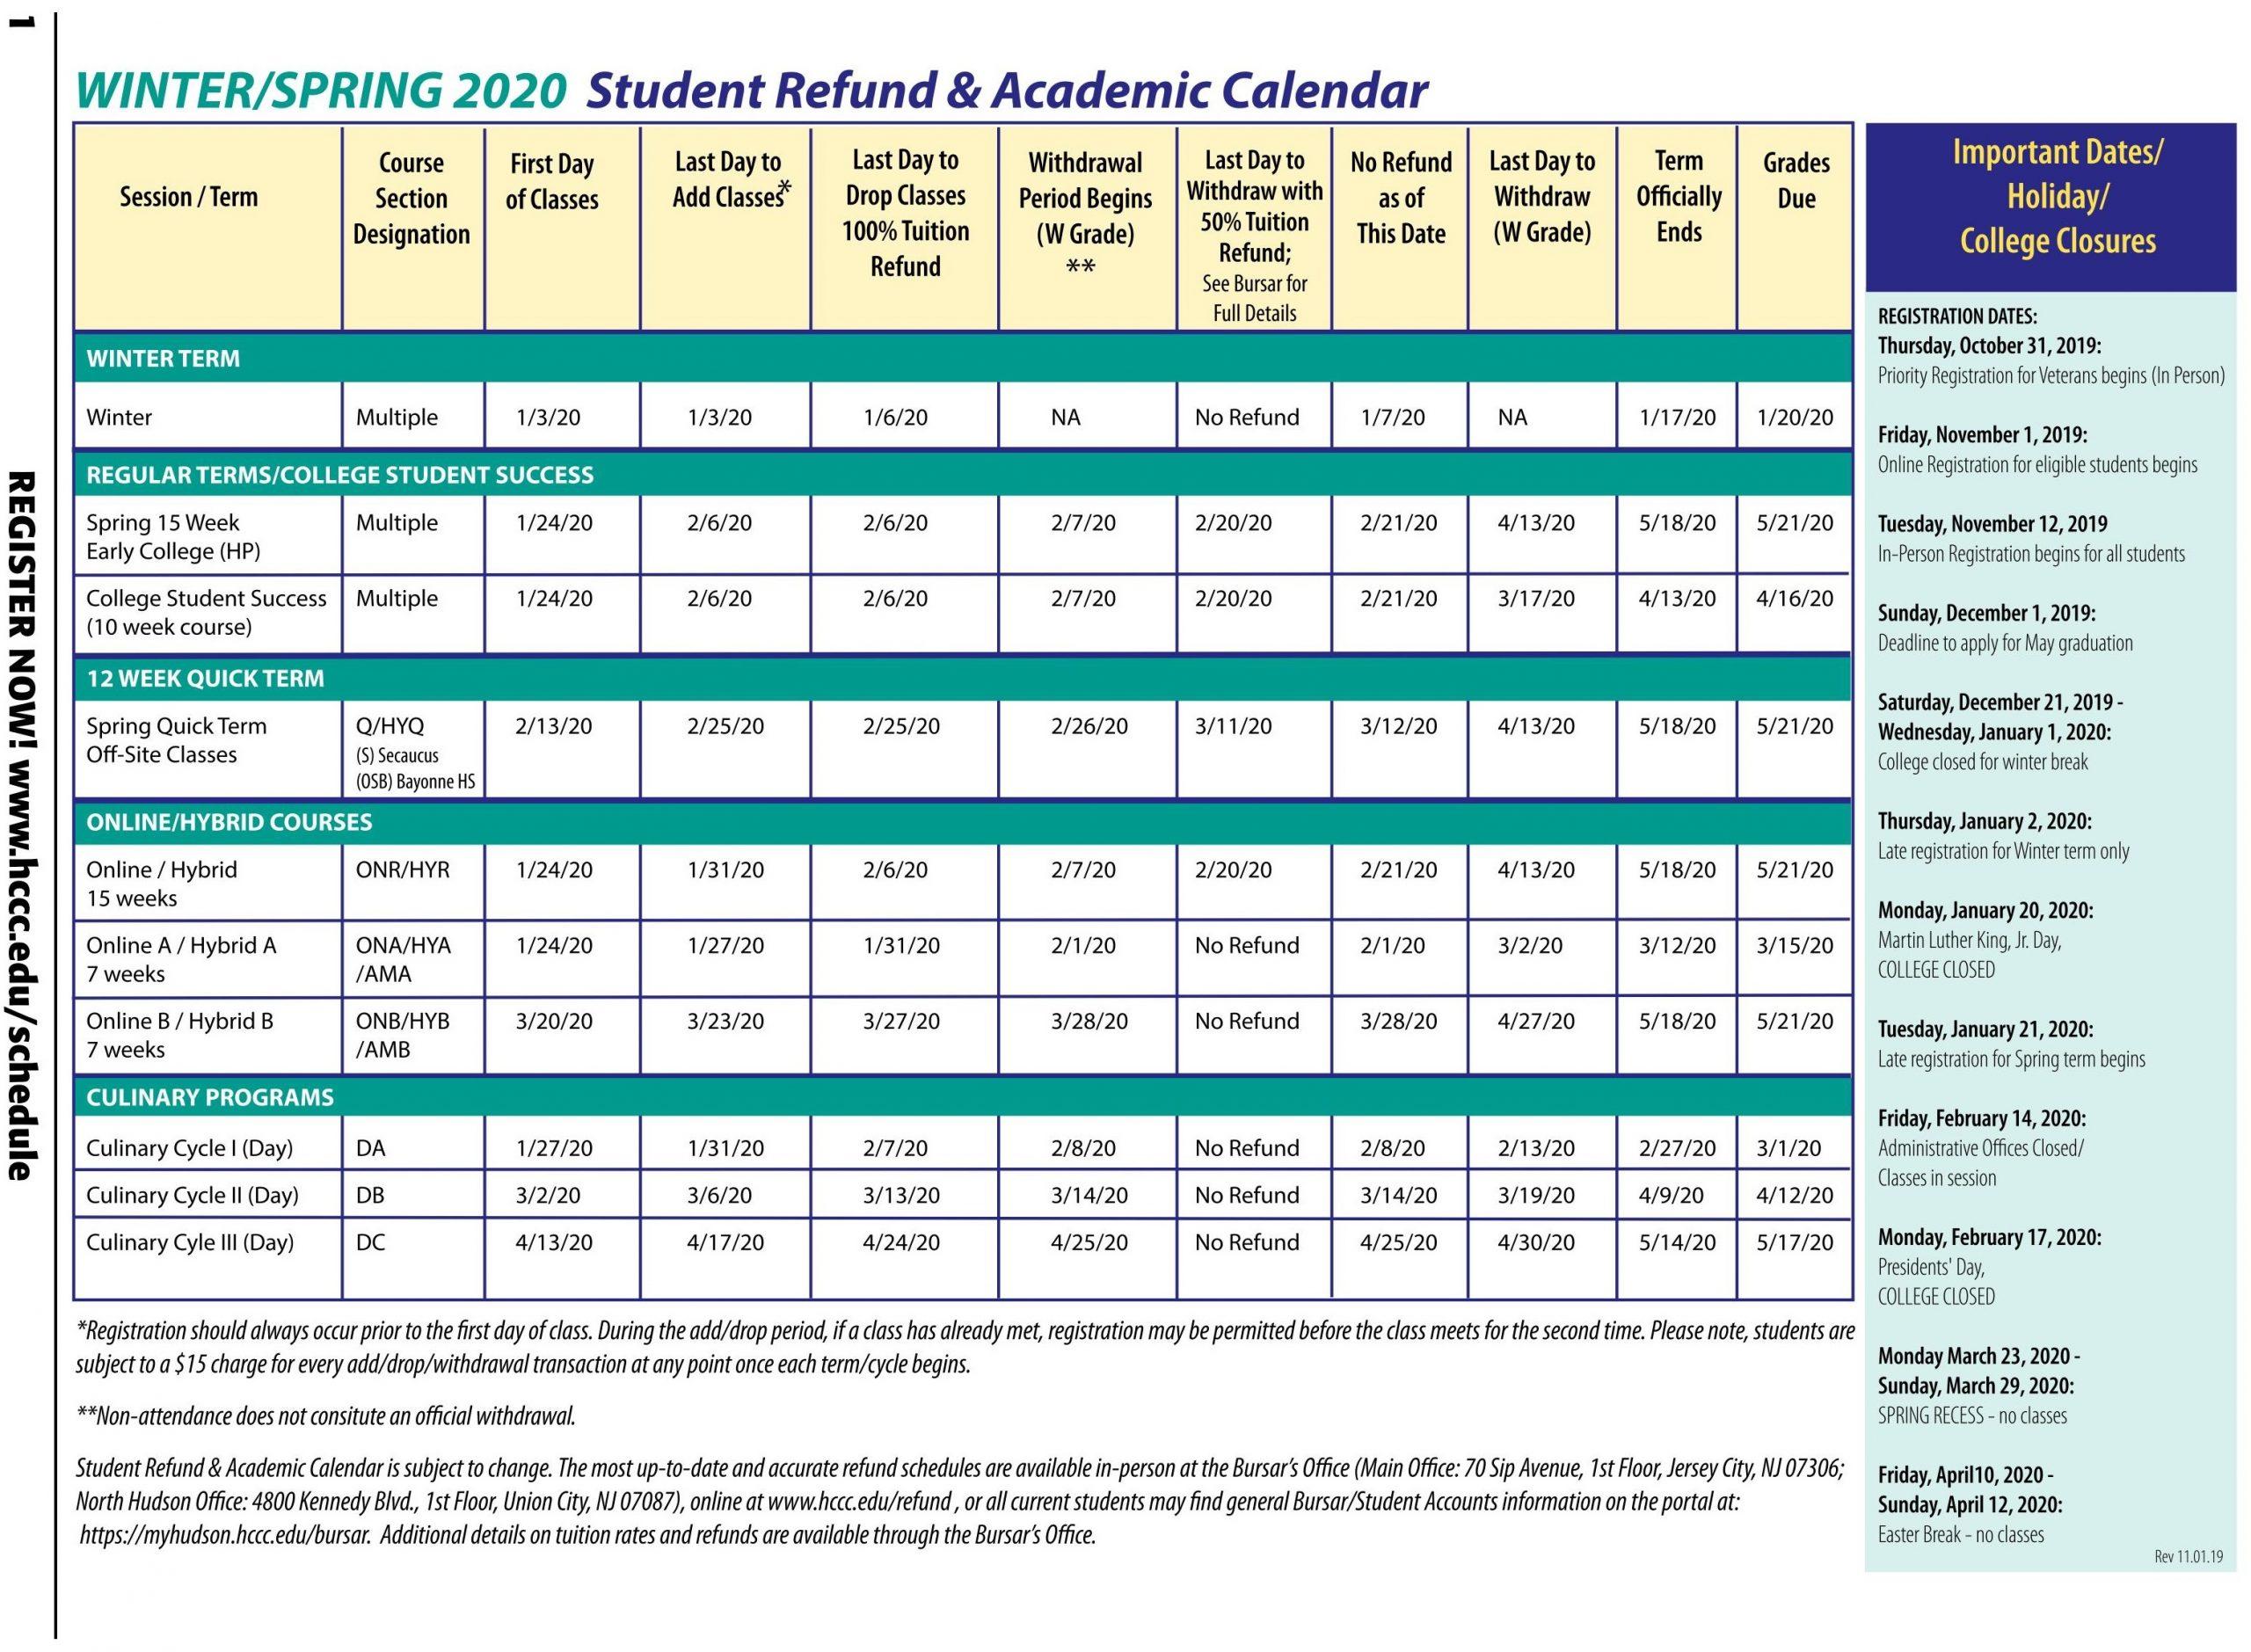 Delaware University Academic Calendar | Printable Calendar Throughout Uri Academic Calendar